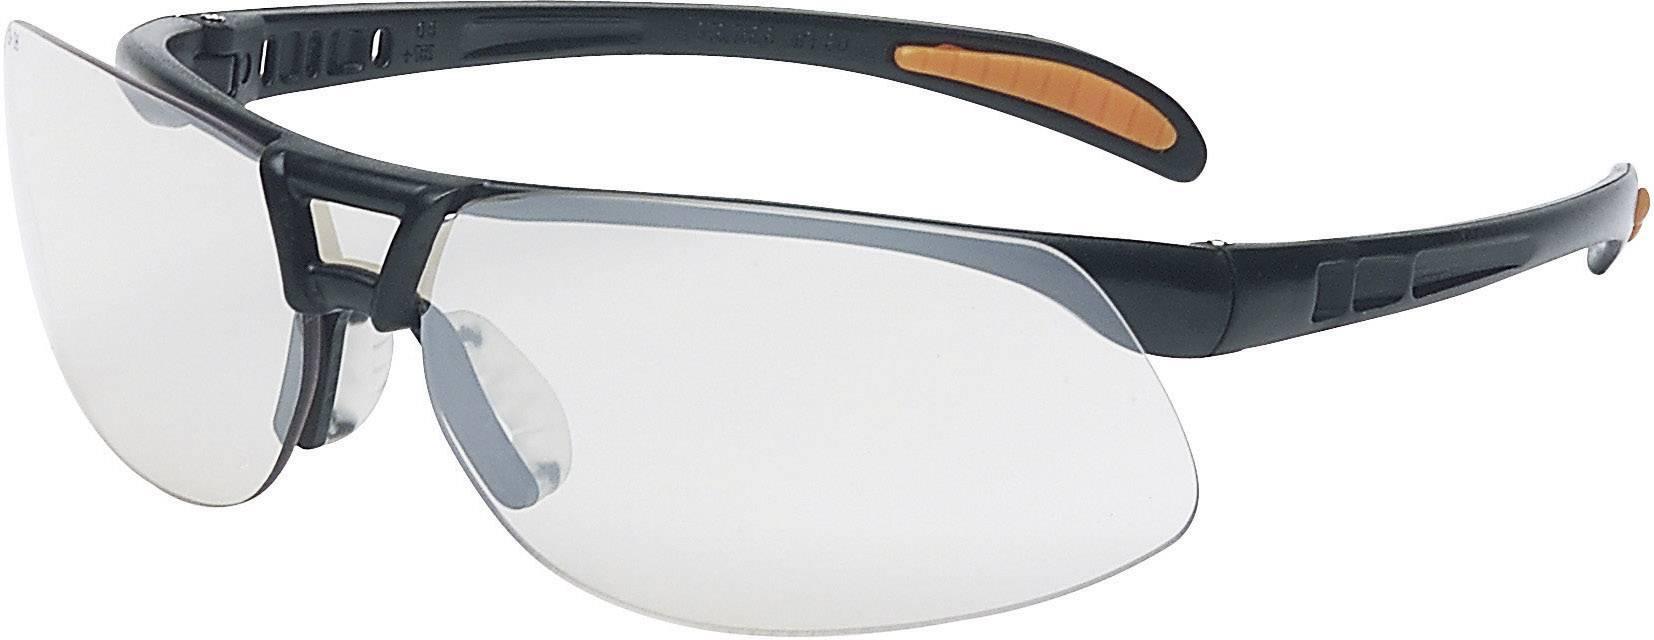 Ochranné okuliare PULSAFE Protégé, číre